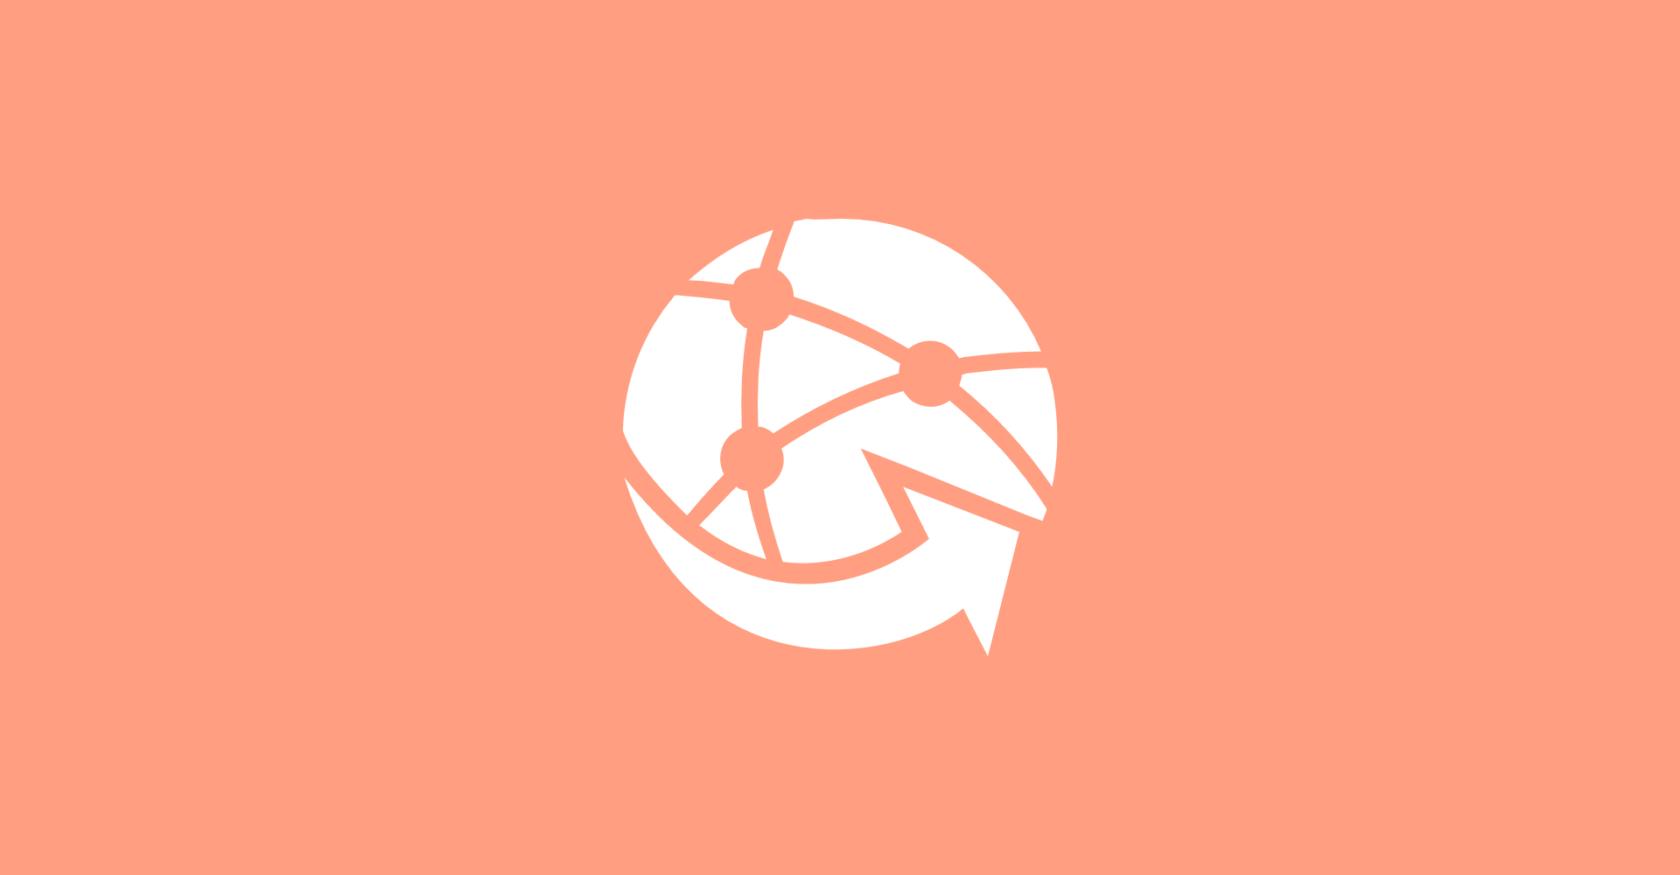 GitHub: README.MD im GitHub-Profil anzeigen